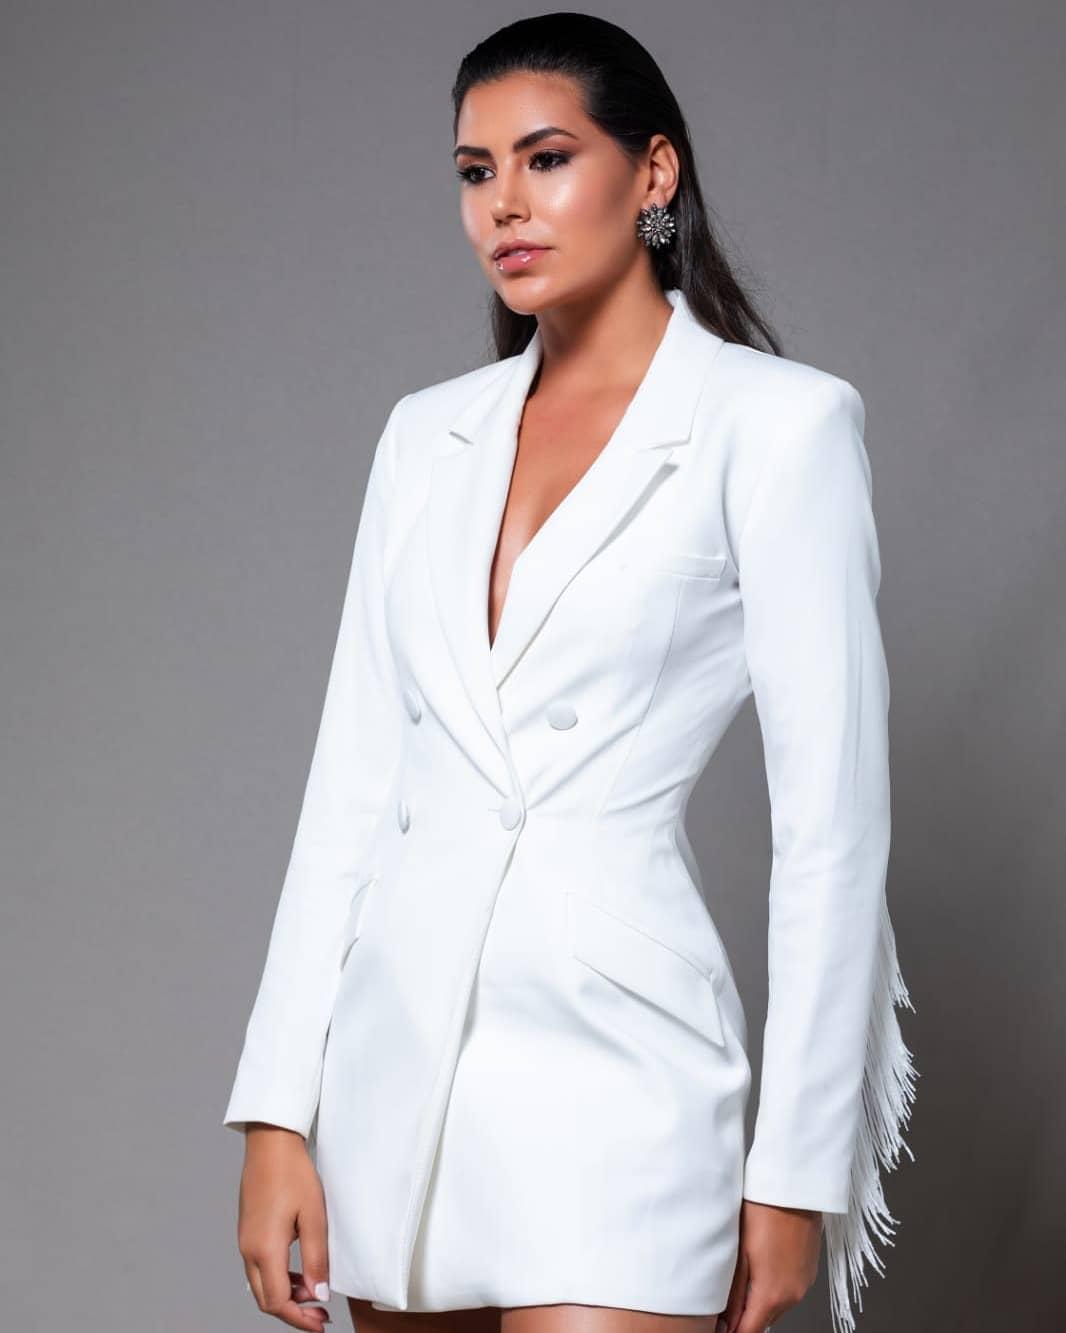 sofia del prado, top 10 de miss universe 2017/reyna hispanoamericana 2015/miss charm spain 2021. - Página 11 Sofiad15